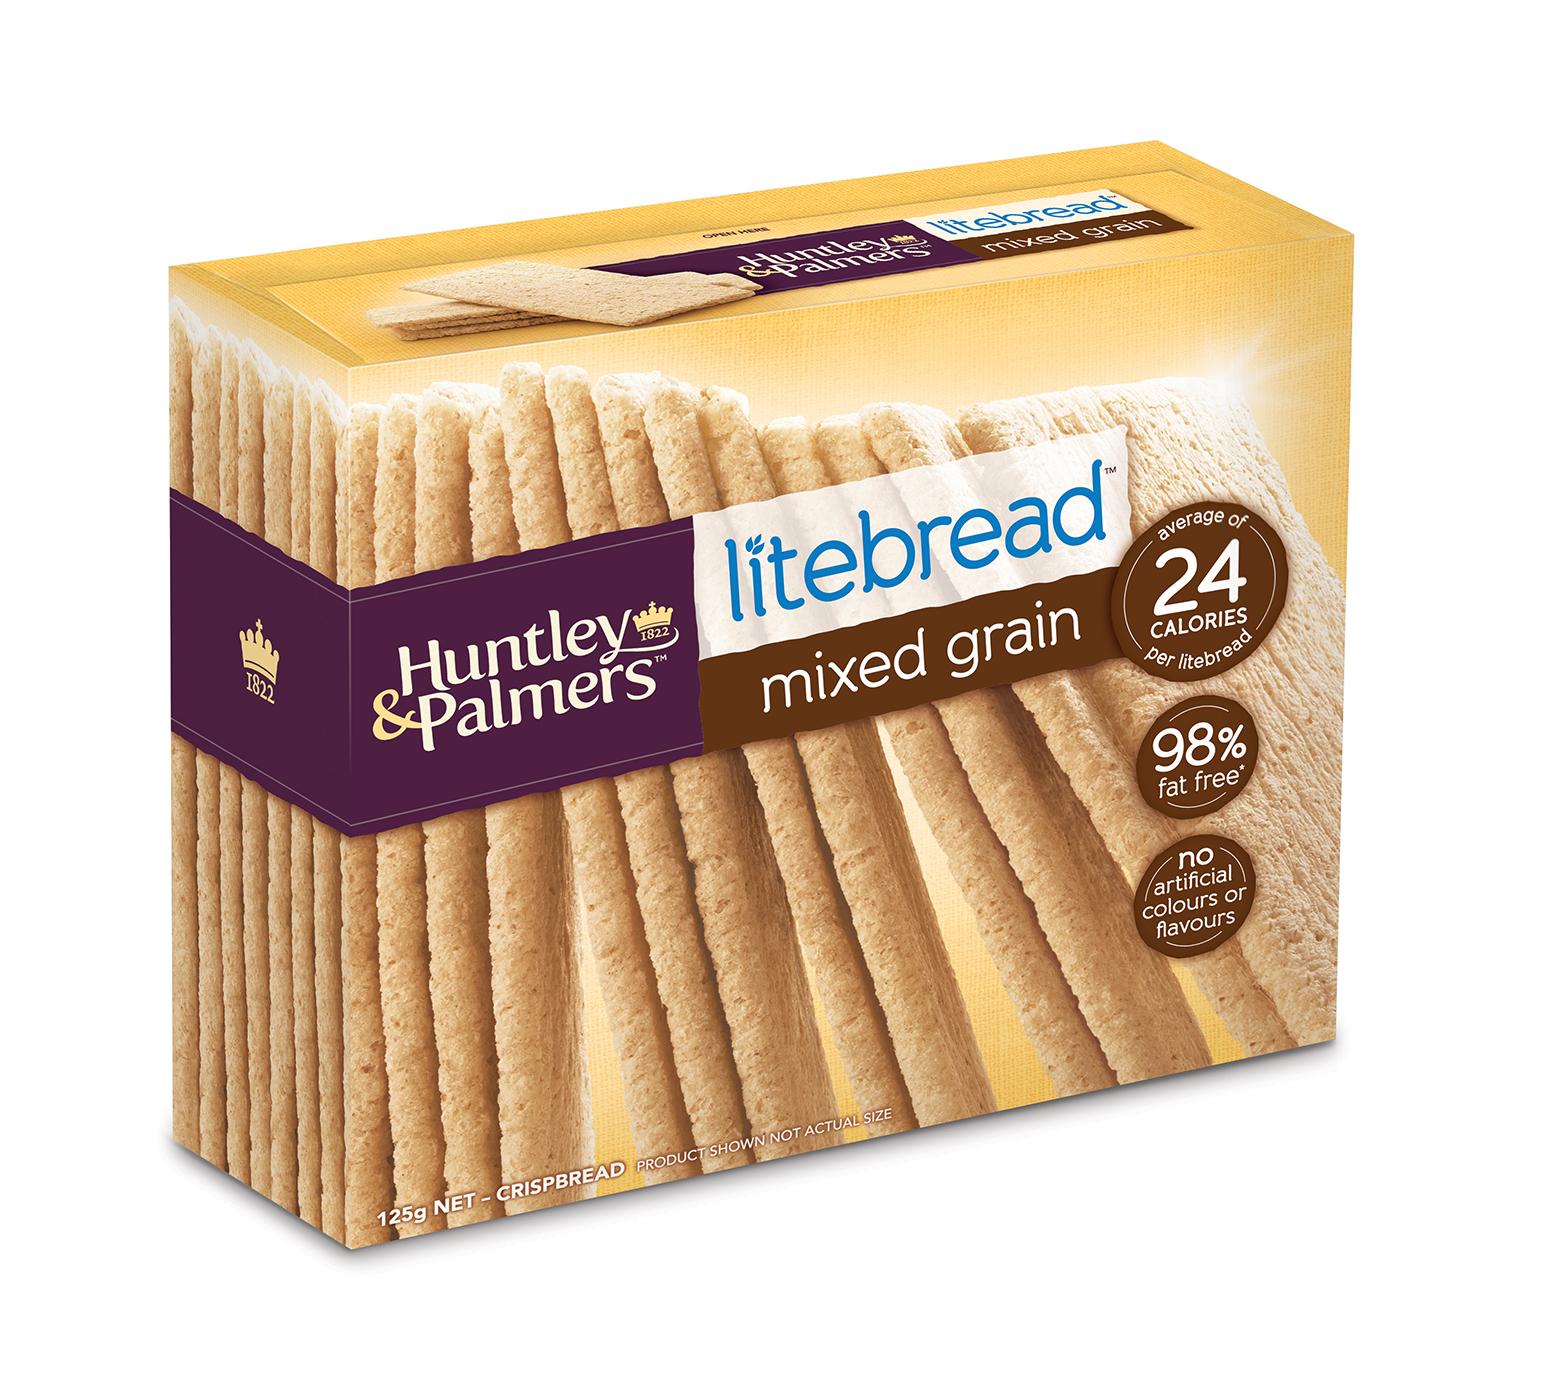 Mixed Grain